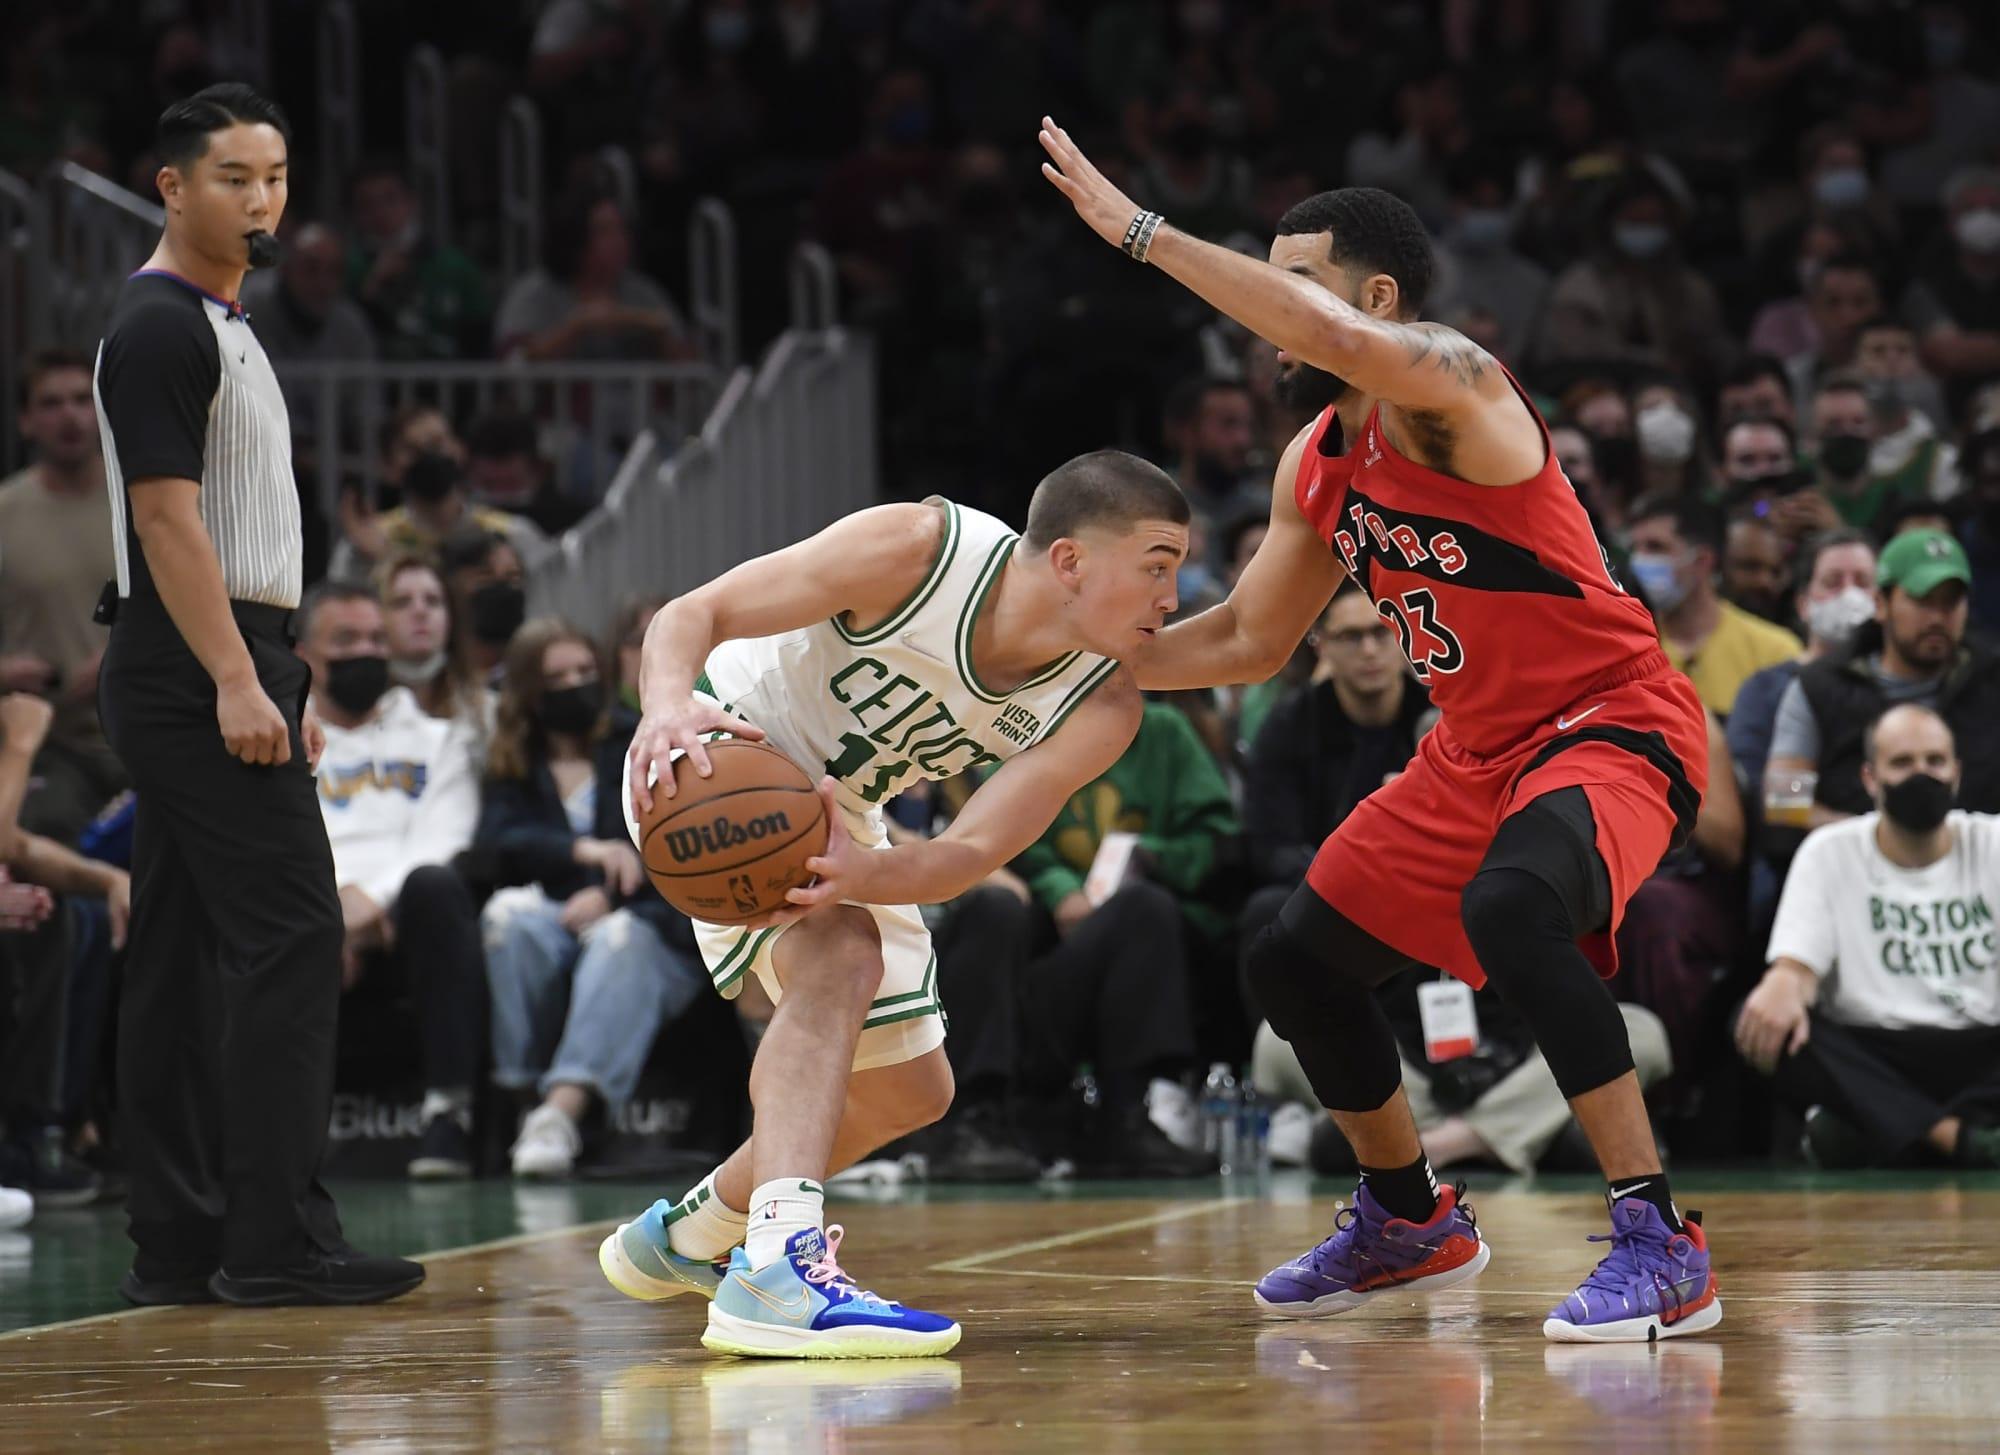 Toronto Raptors: 3 takeaways after preseason loss to Celtics